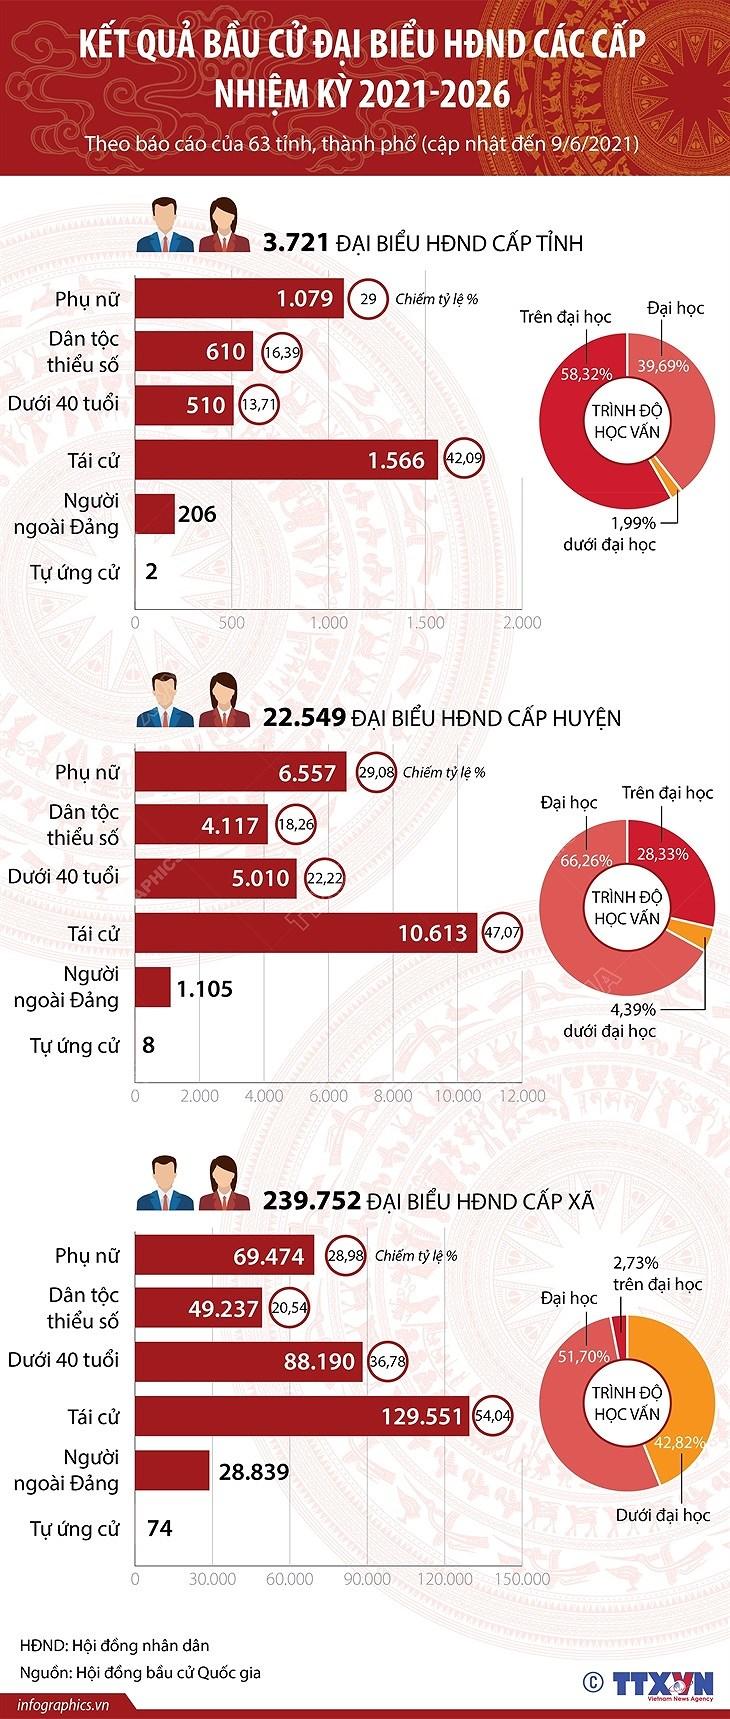 [Infographics] Ket qua bau cu dai bieu HDND cac cap nhiem ky 2021-2026 hinh anh 1